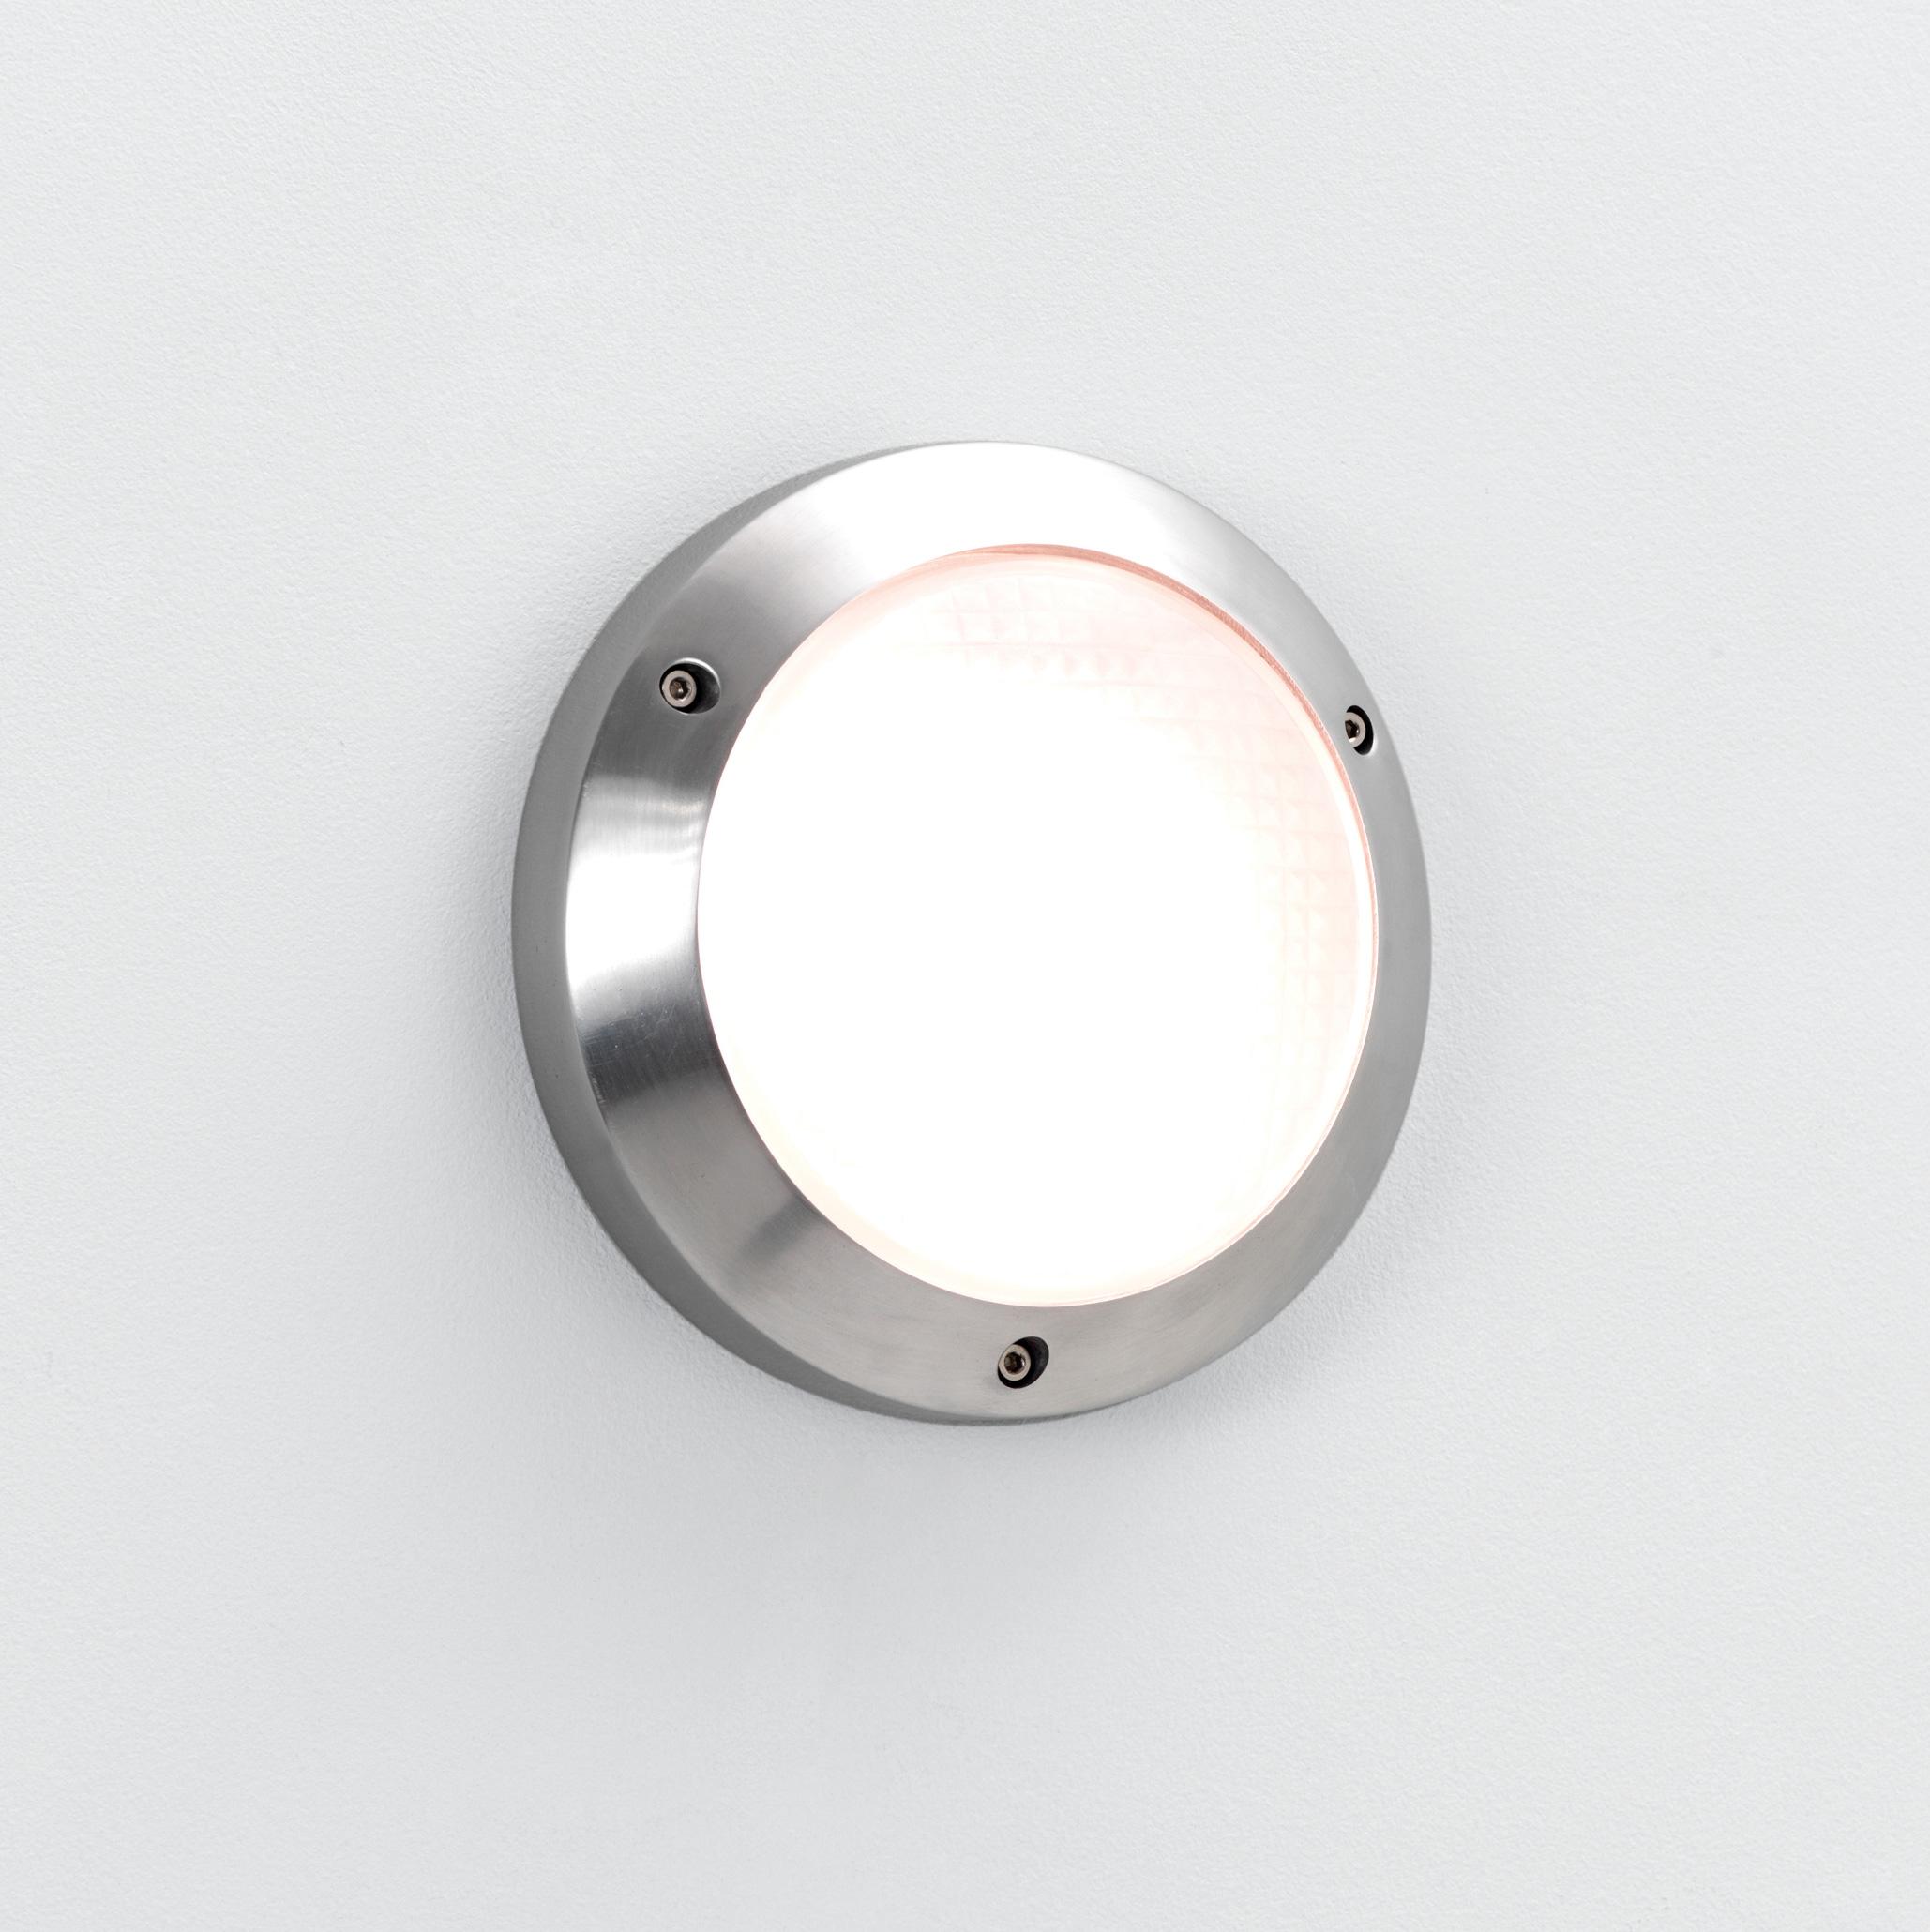 online store ffe89 7e92e Details about ASTRO Toronto Classsic 170 0844 round bathroom wall light 1 X  40W IP65 aluminium